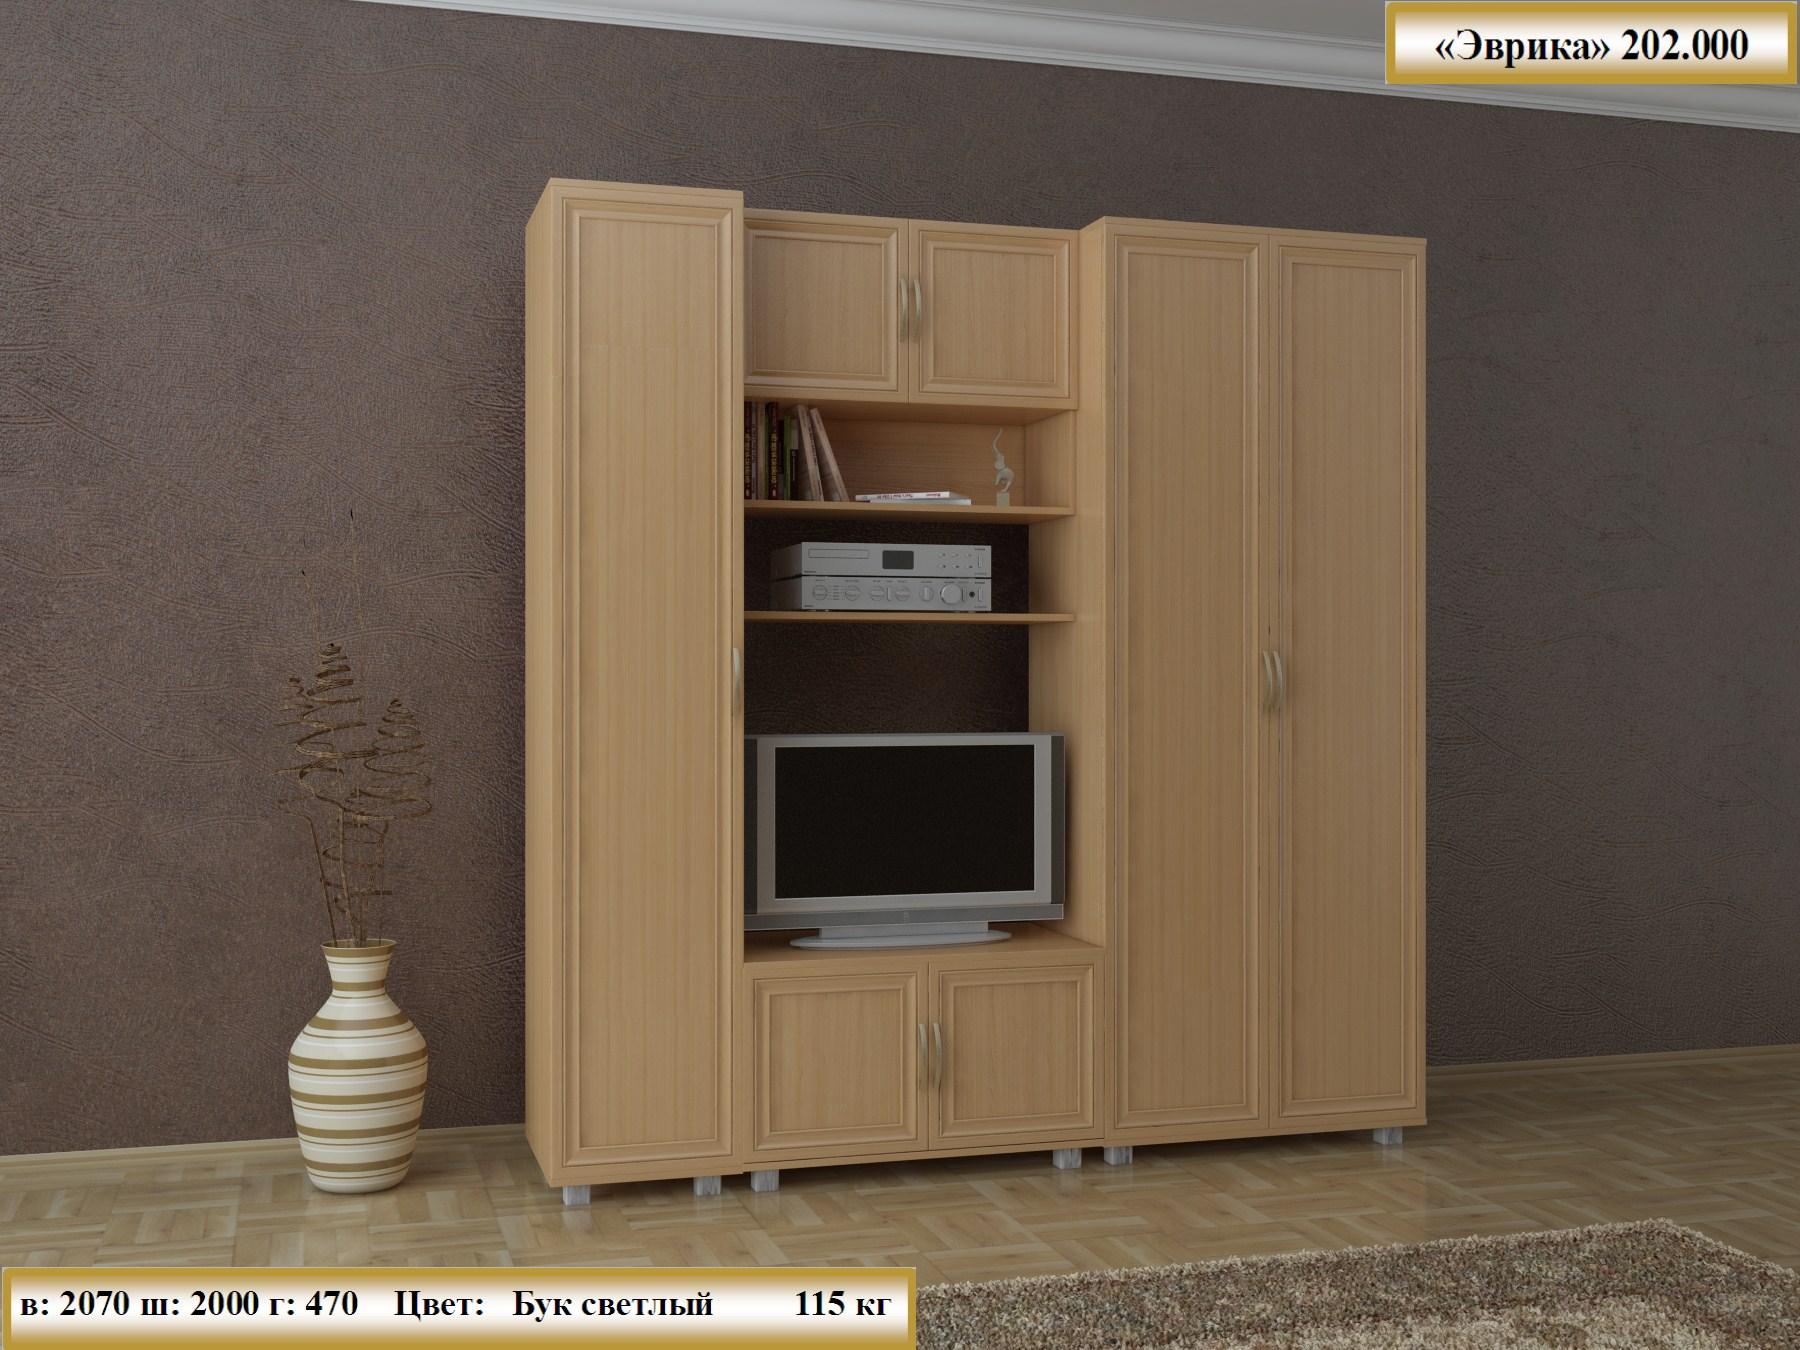 Корпус. мебель: кровати, матрасы, стенки, прихожие, шкафы-ку.